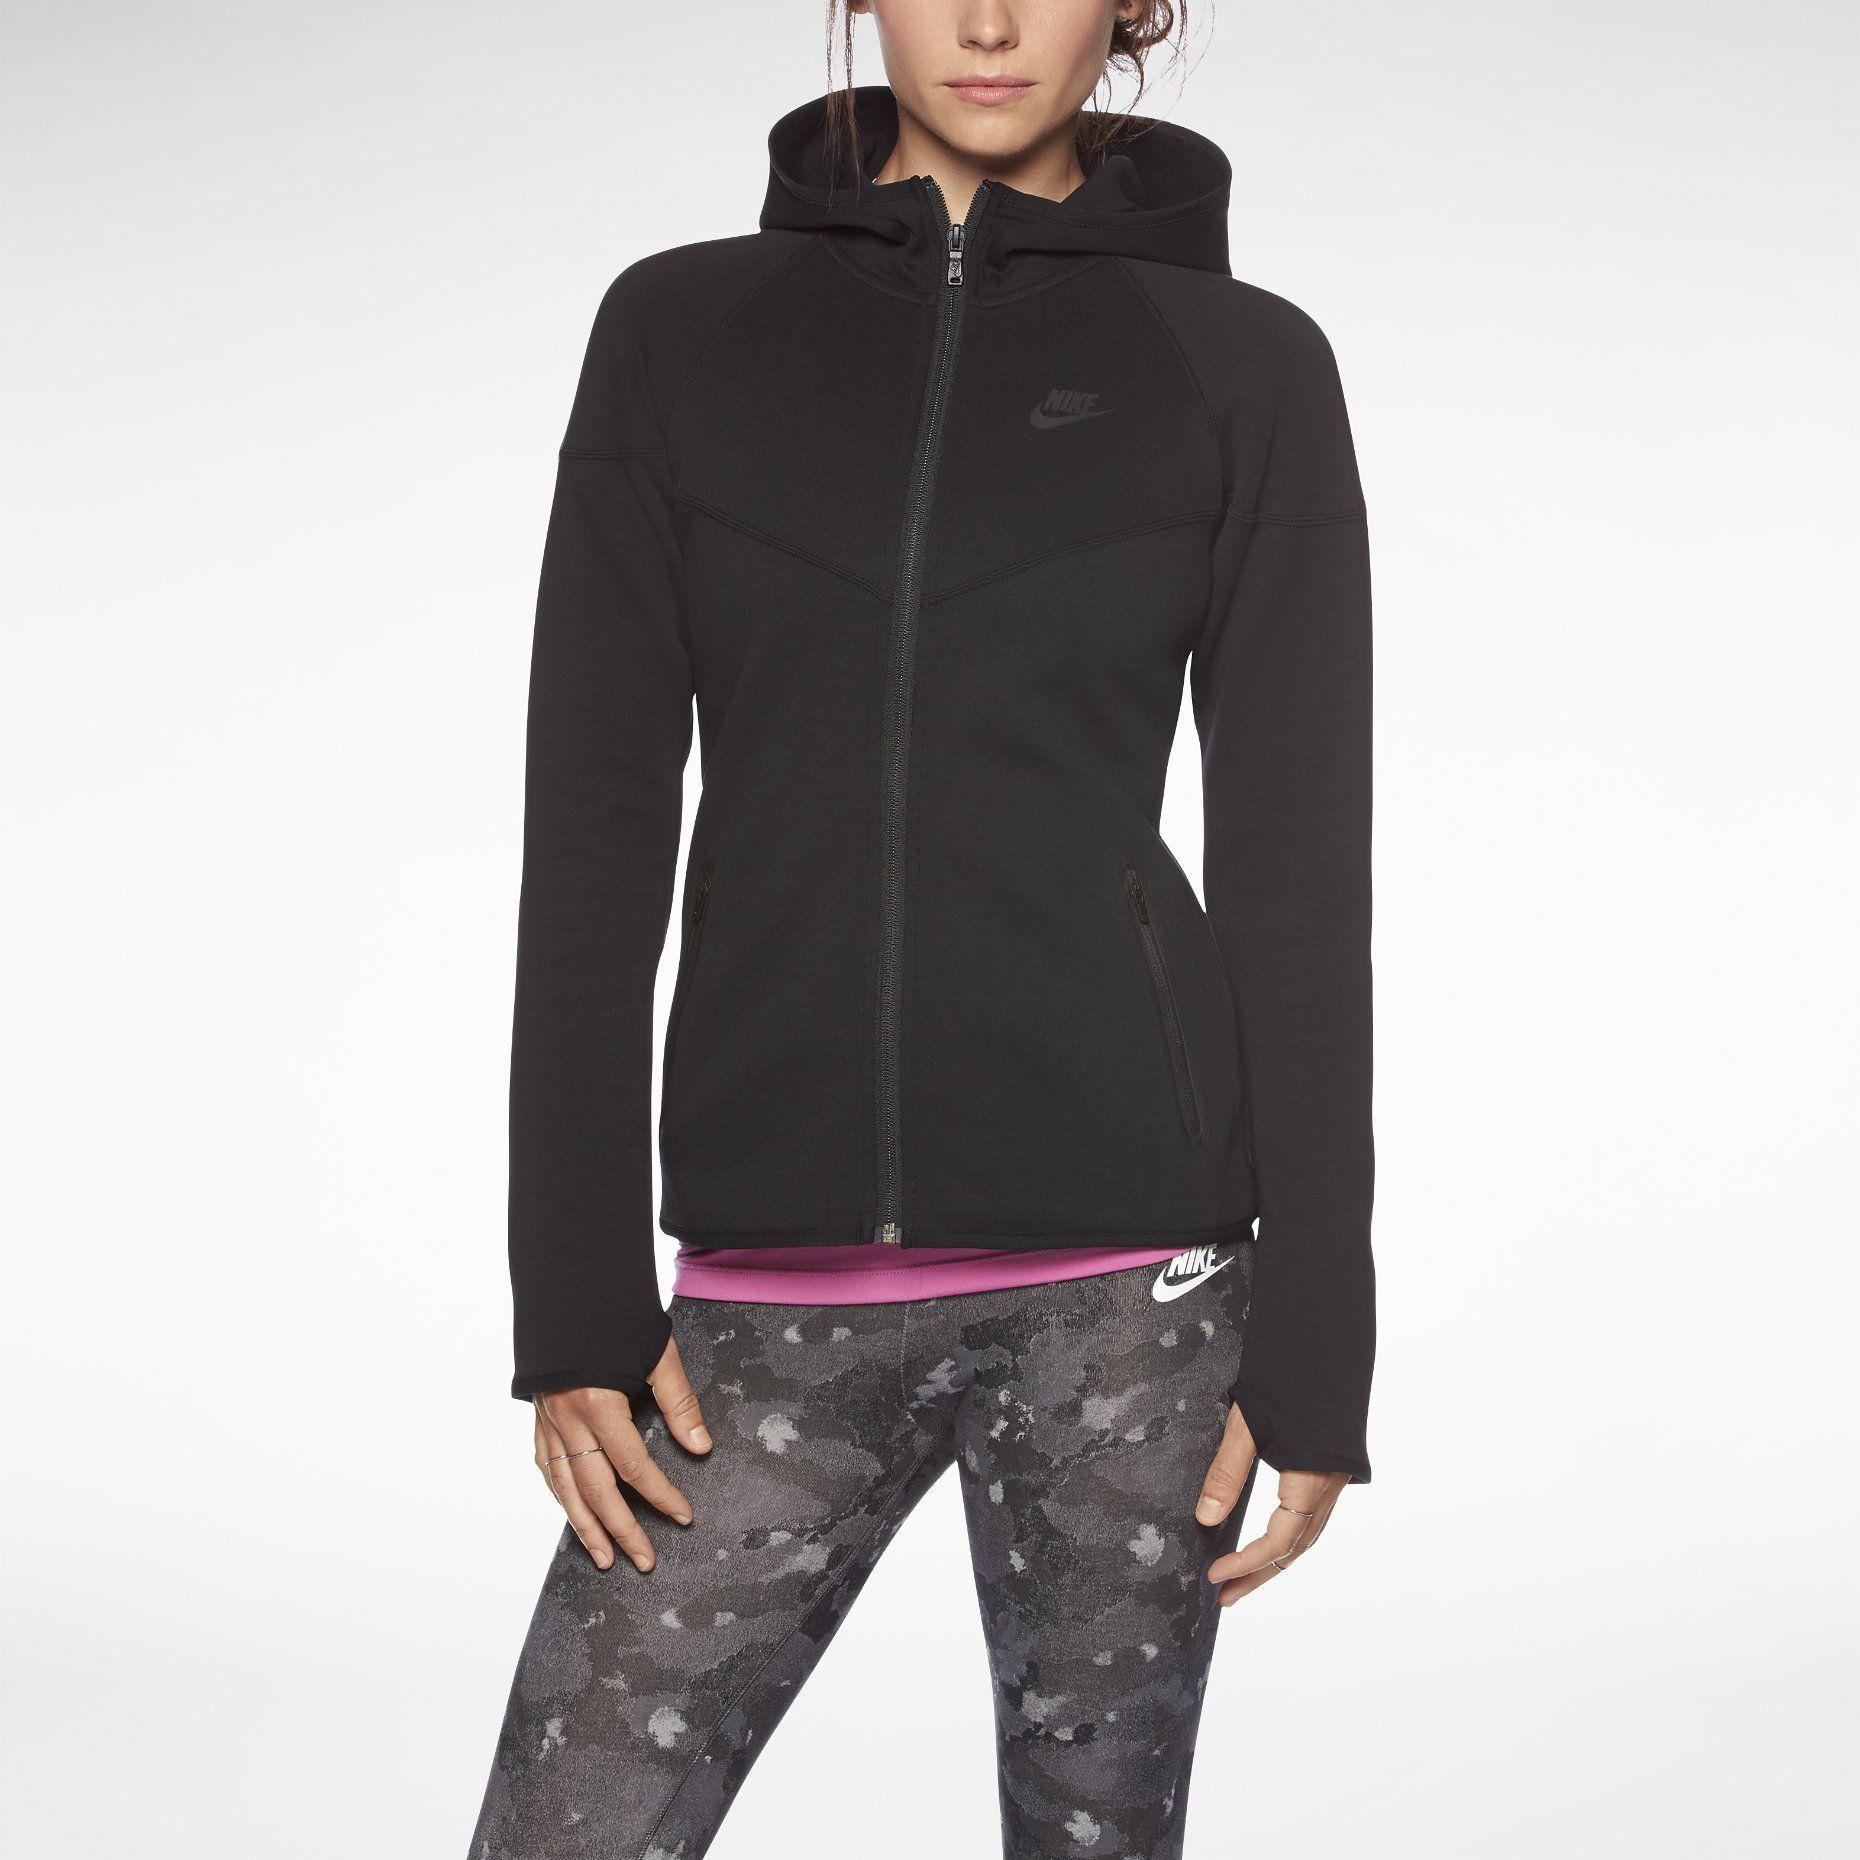 Nike Store. Nike Tech Fleece Windrunner FullZip Women's